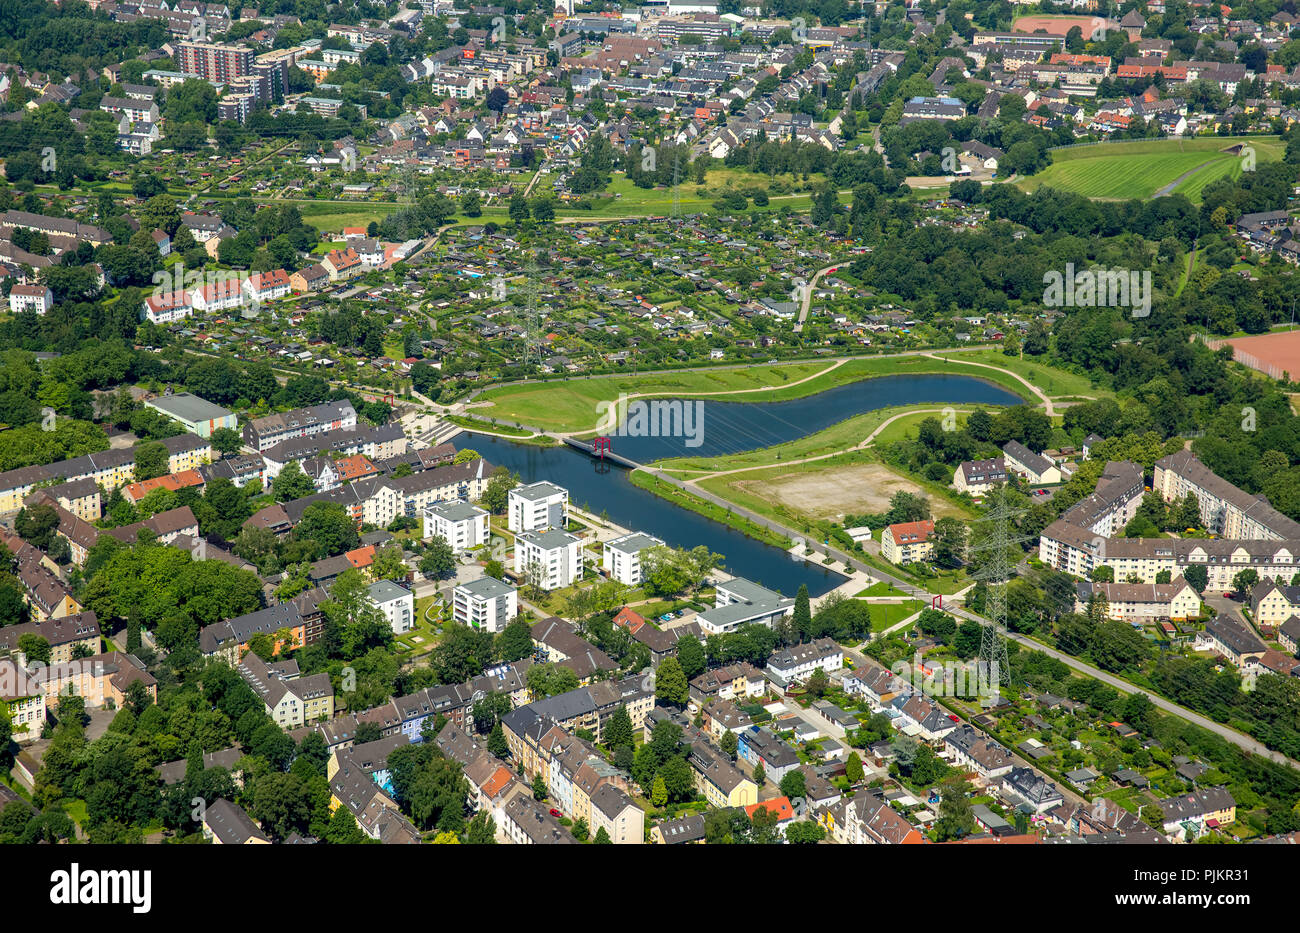 Niederfeldsee Altendorf, Essen, Ruhr area, North Rhine-Westphalia, Germany - Stock Image